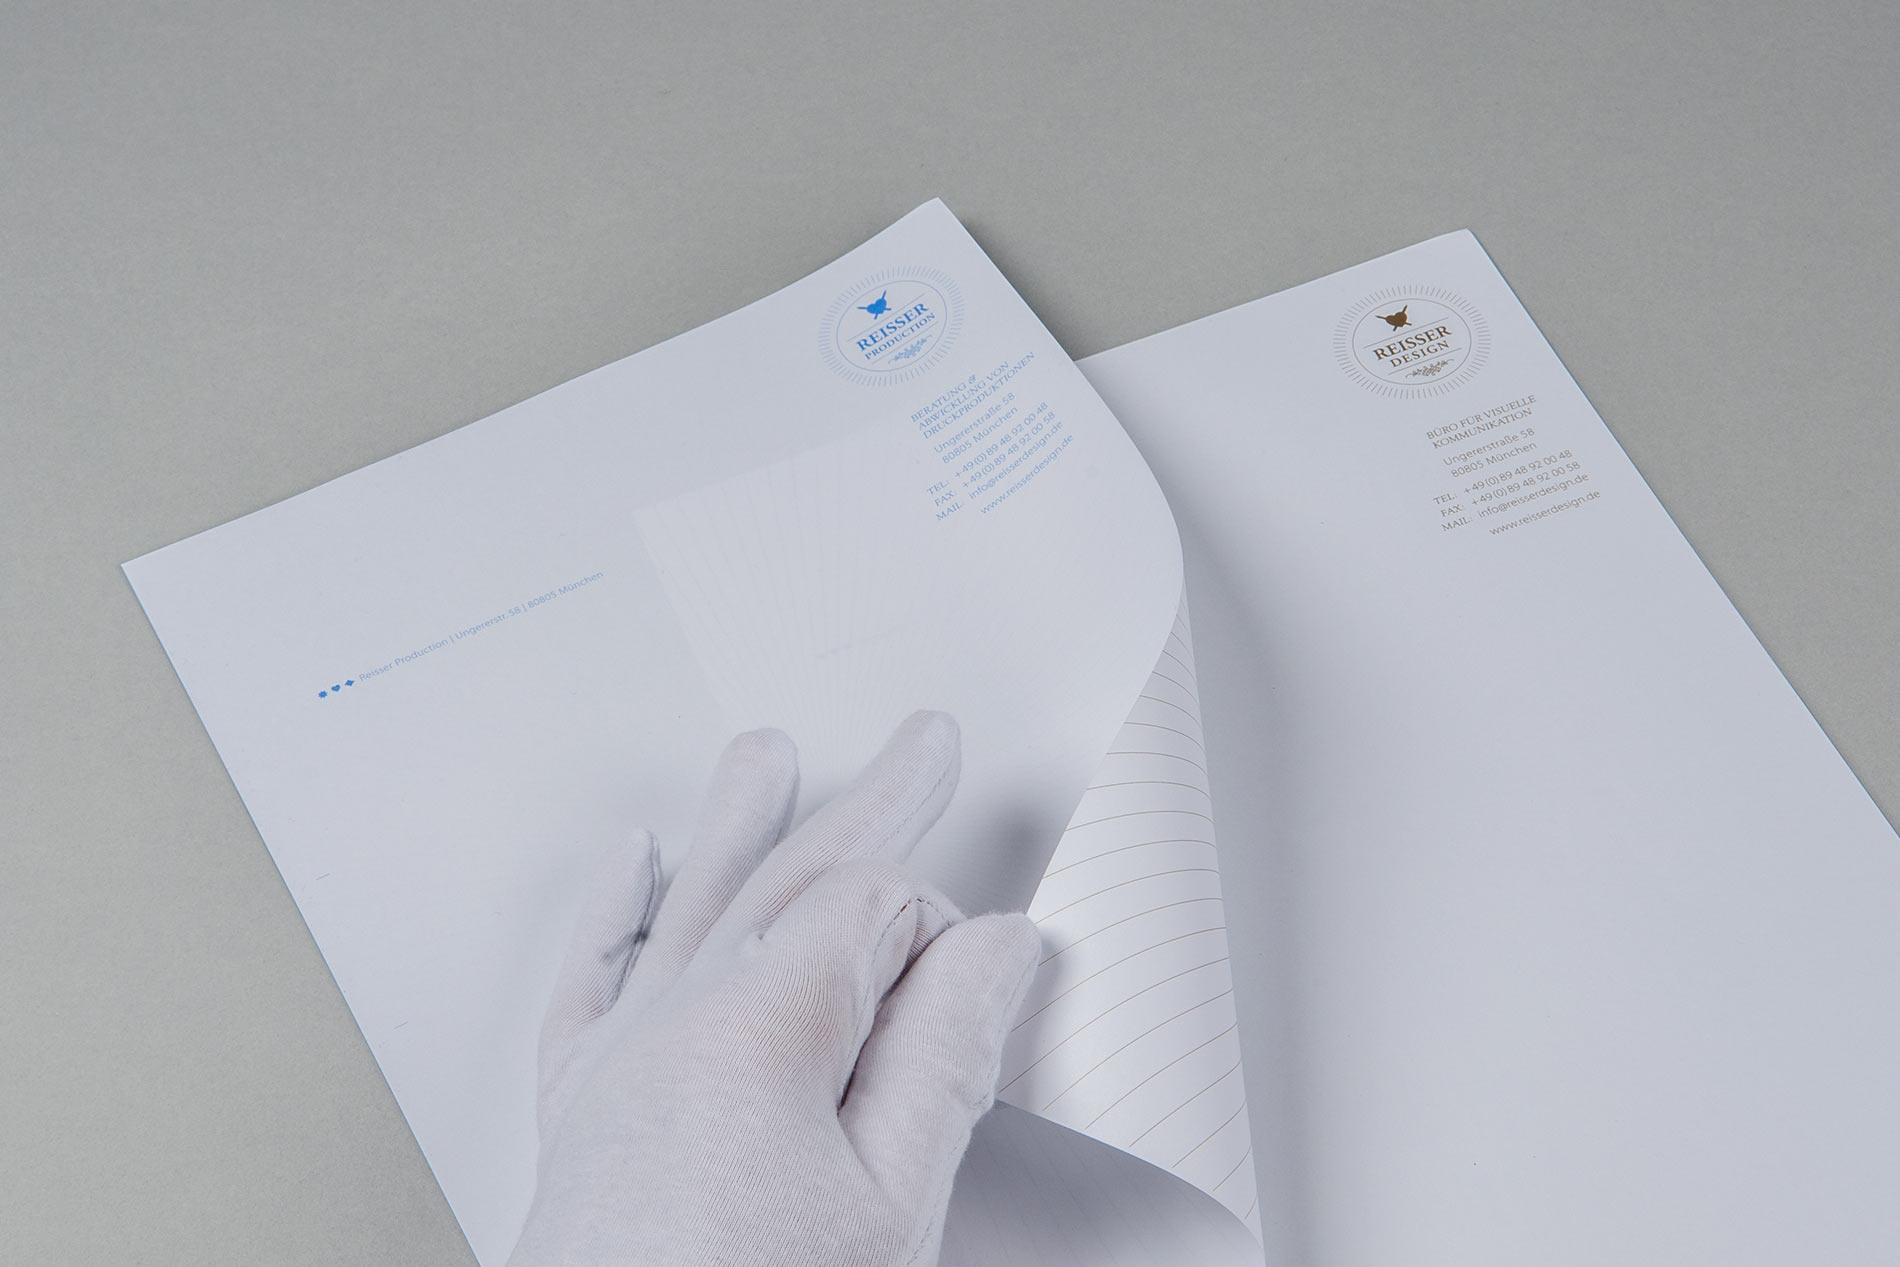 Janina-Lermer-Markengestaltung-Branddesign-Corporate-Design-Reisserdesign-Stationary-Briefpapier